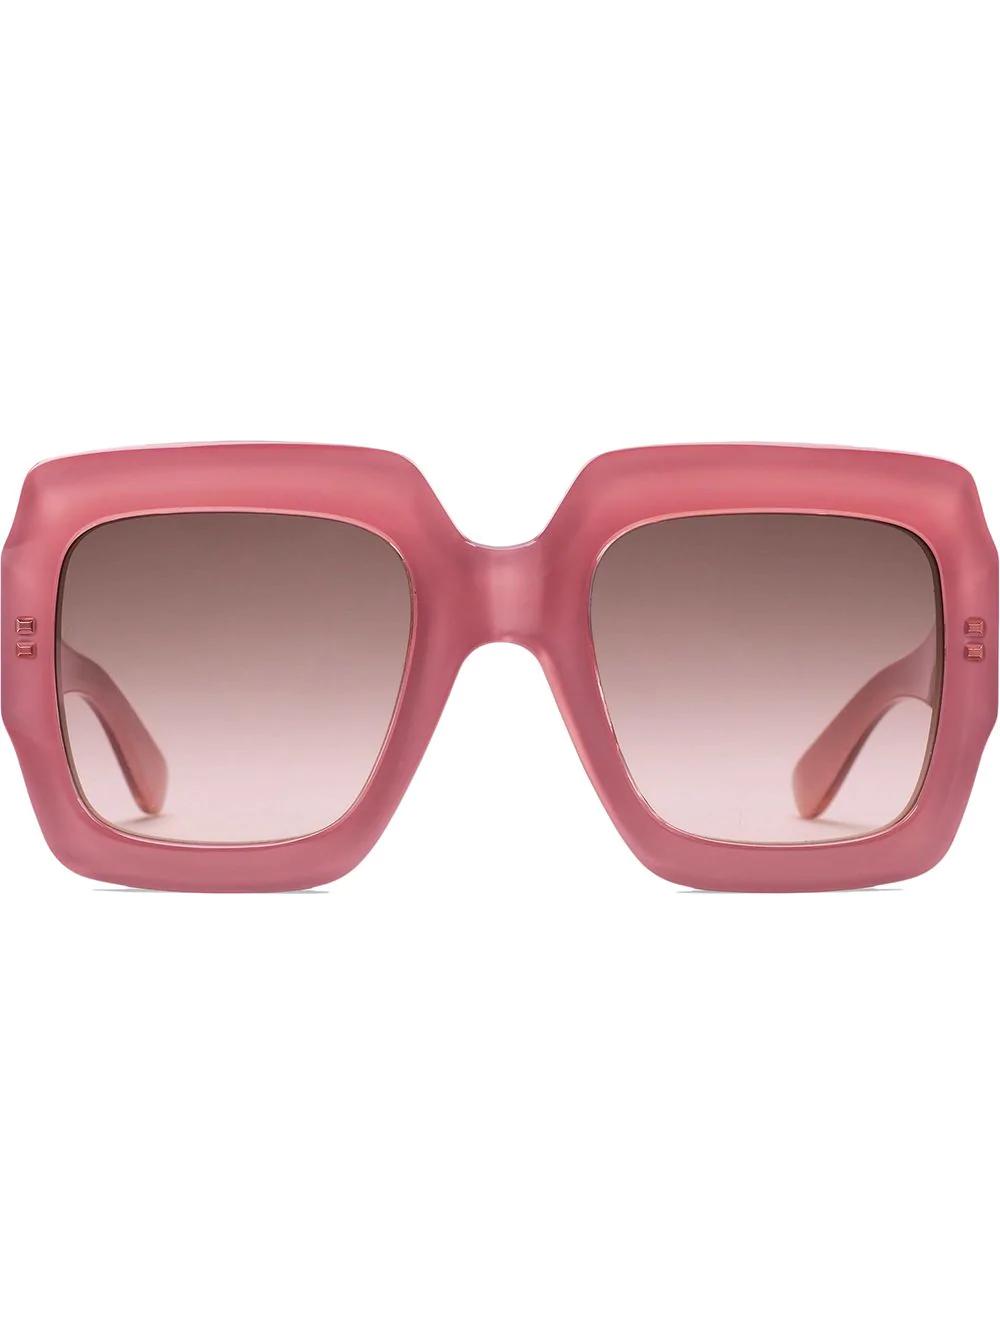 d52095cfdd3 Gucci Eyewear Square-Frame Sunglasses - Pink